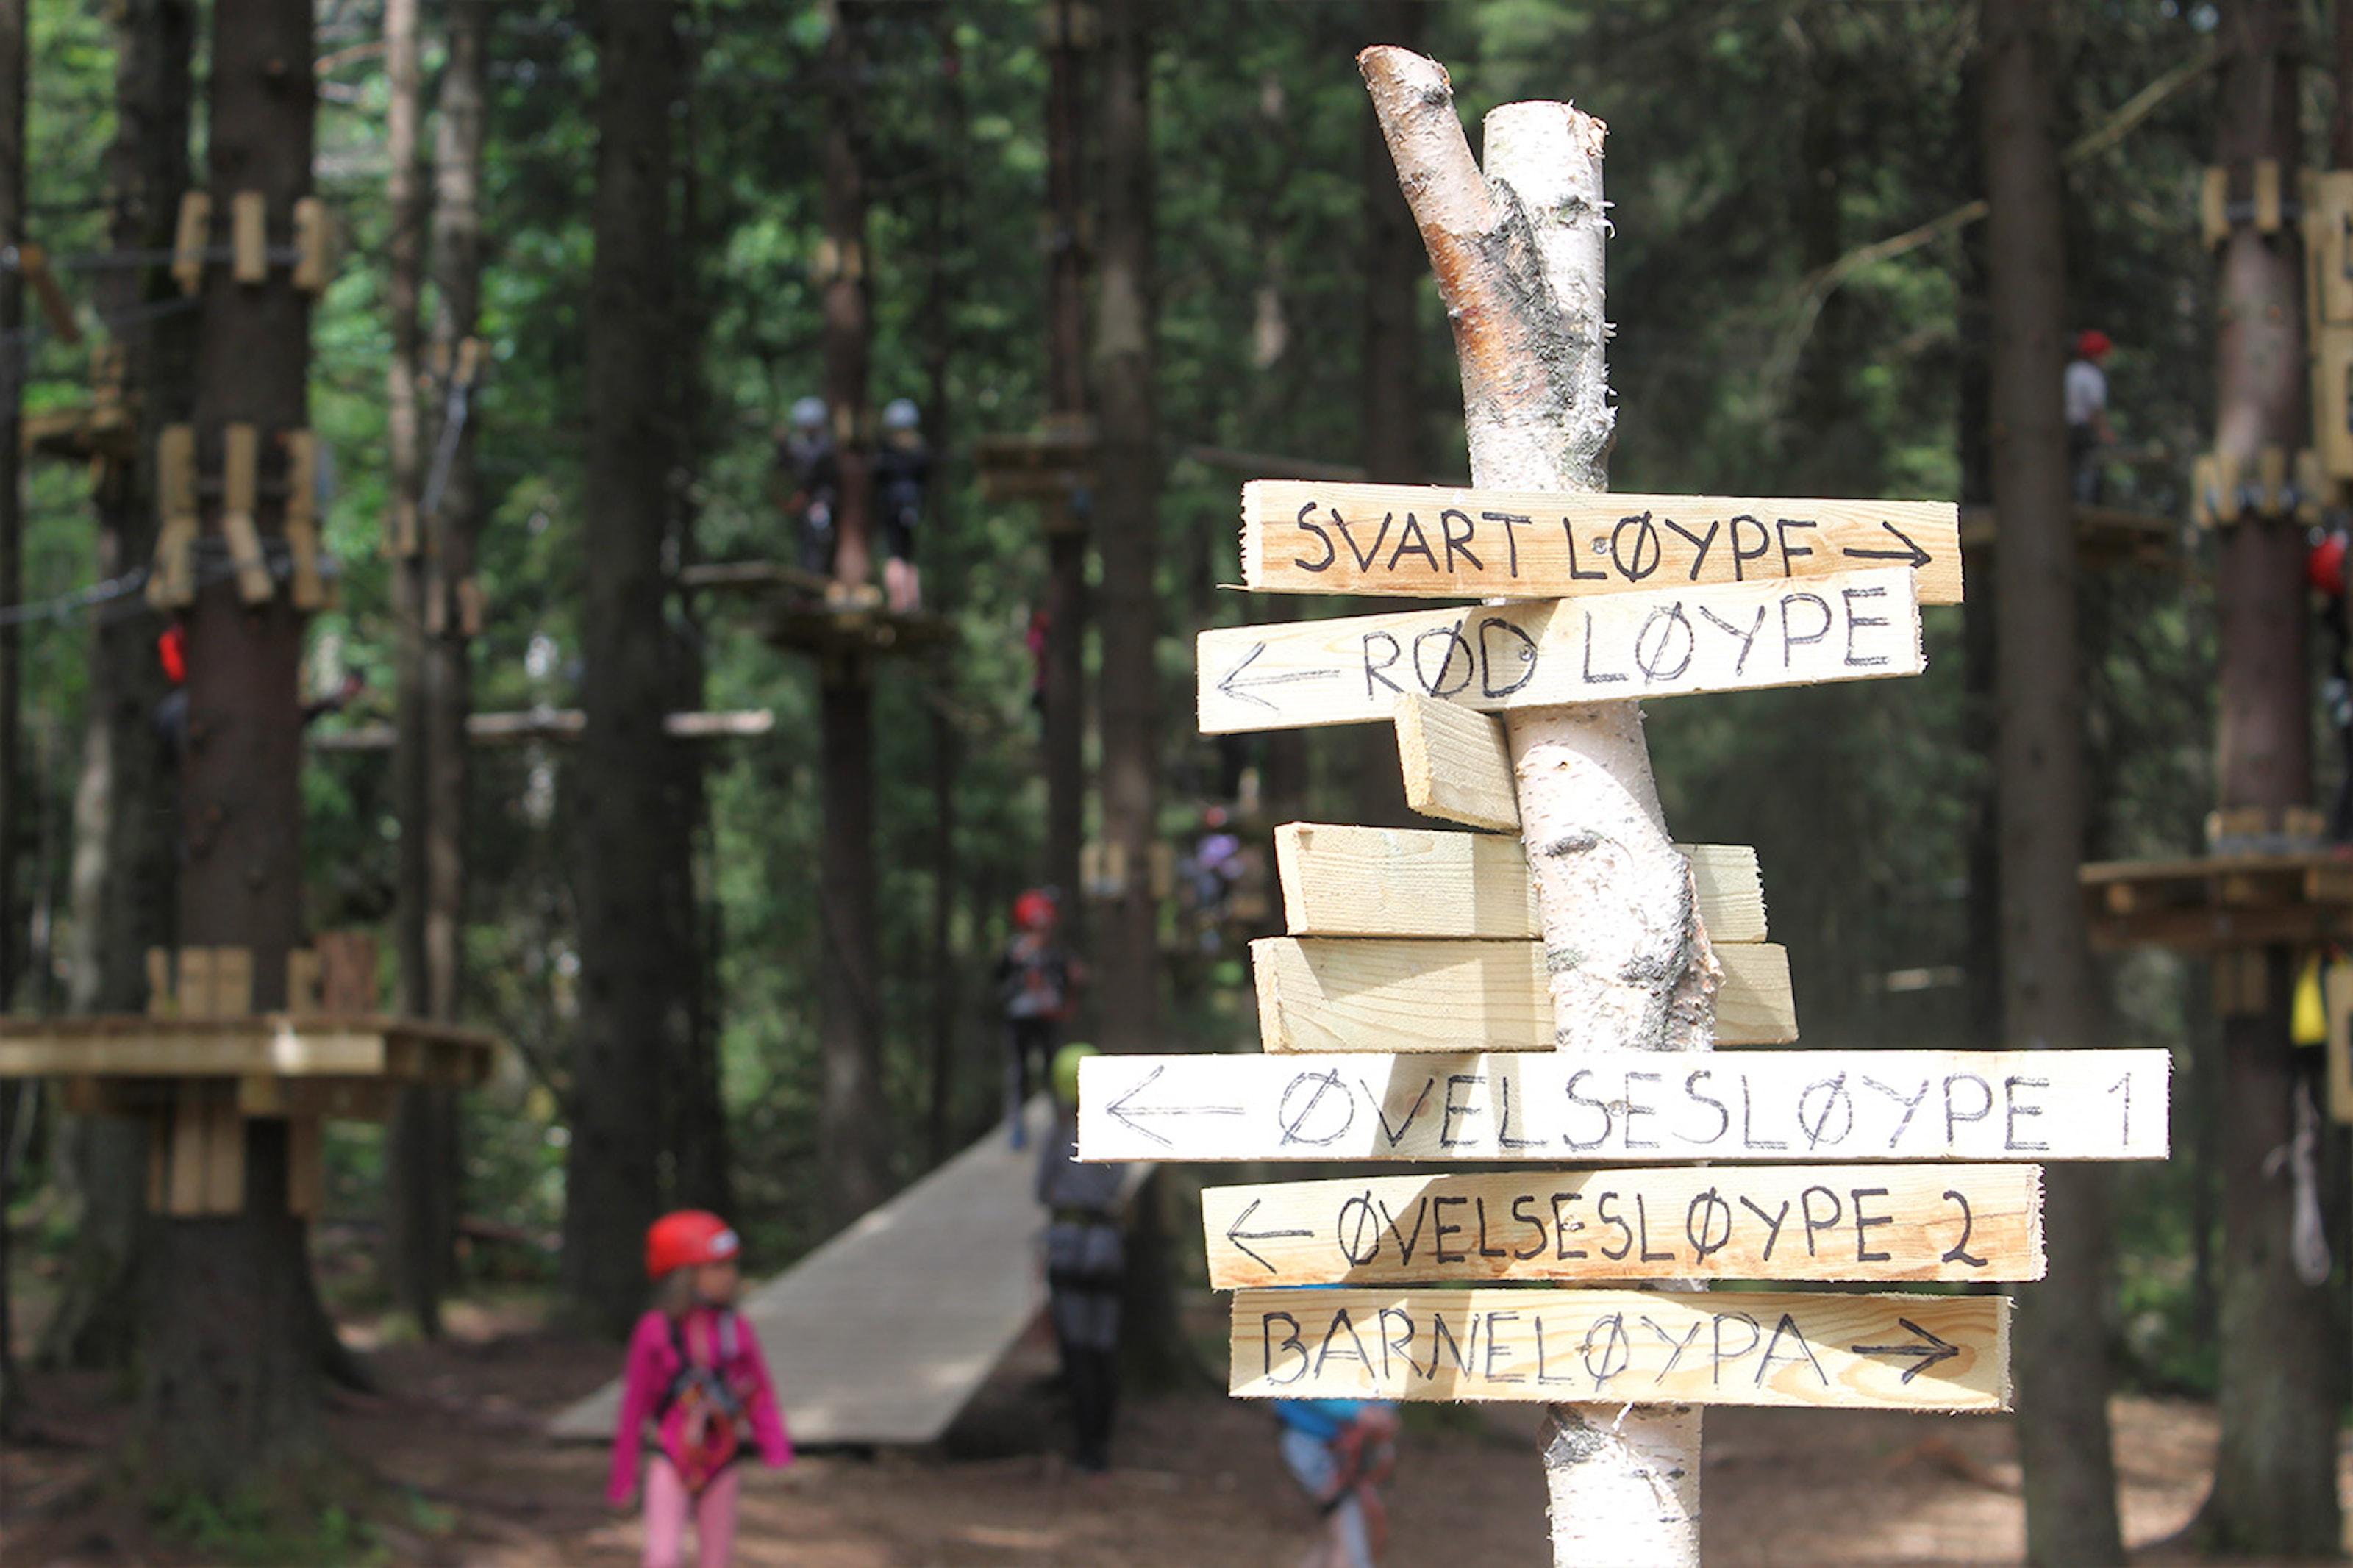 50% på billetter til Oslo Klatrepark i Groruddalen